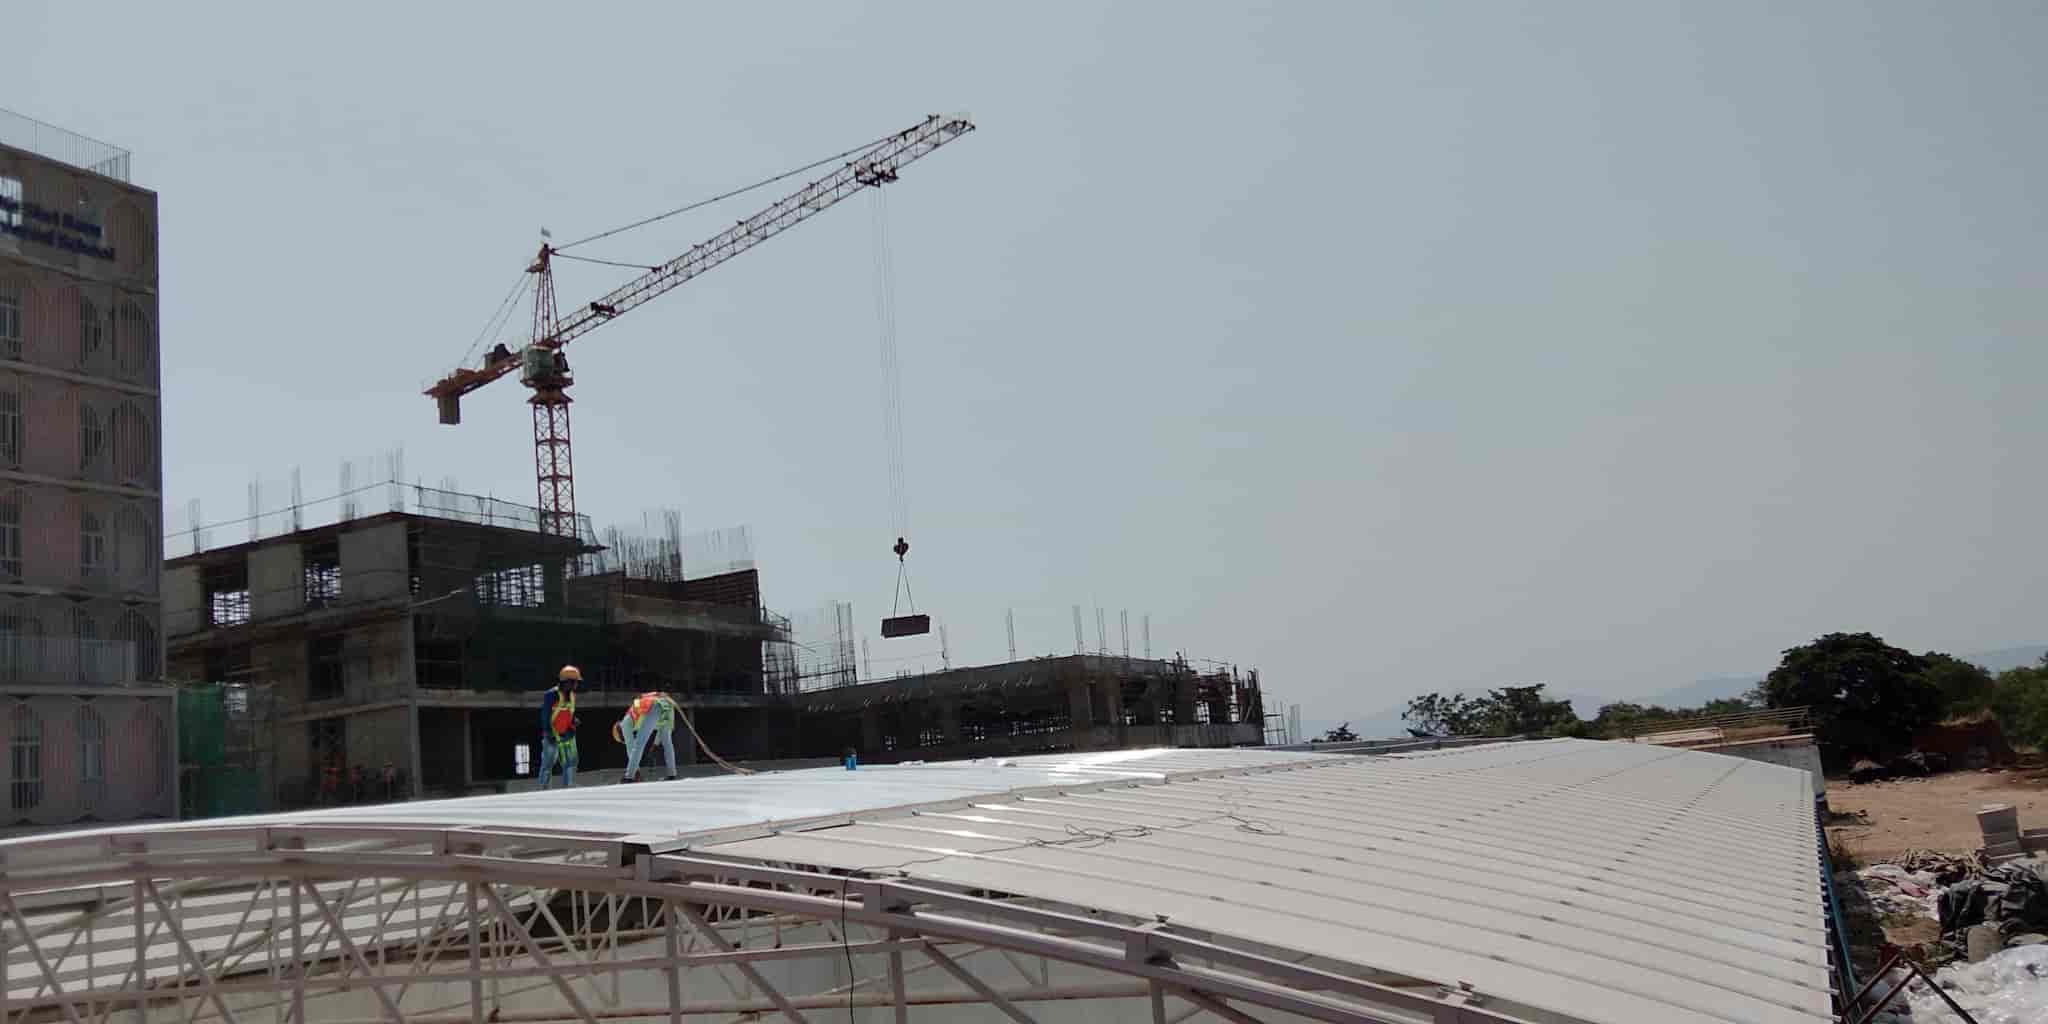 Rnp Scaffolding And Formwork Pvt Ltd, Mahape - Scaffolding